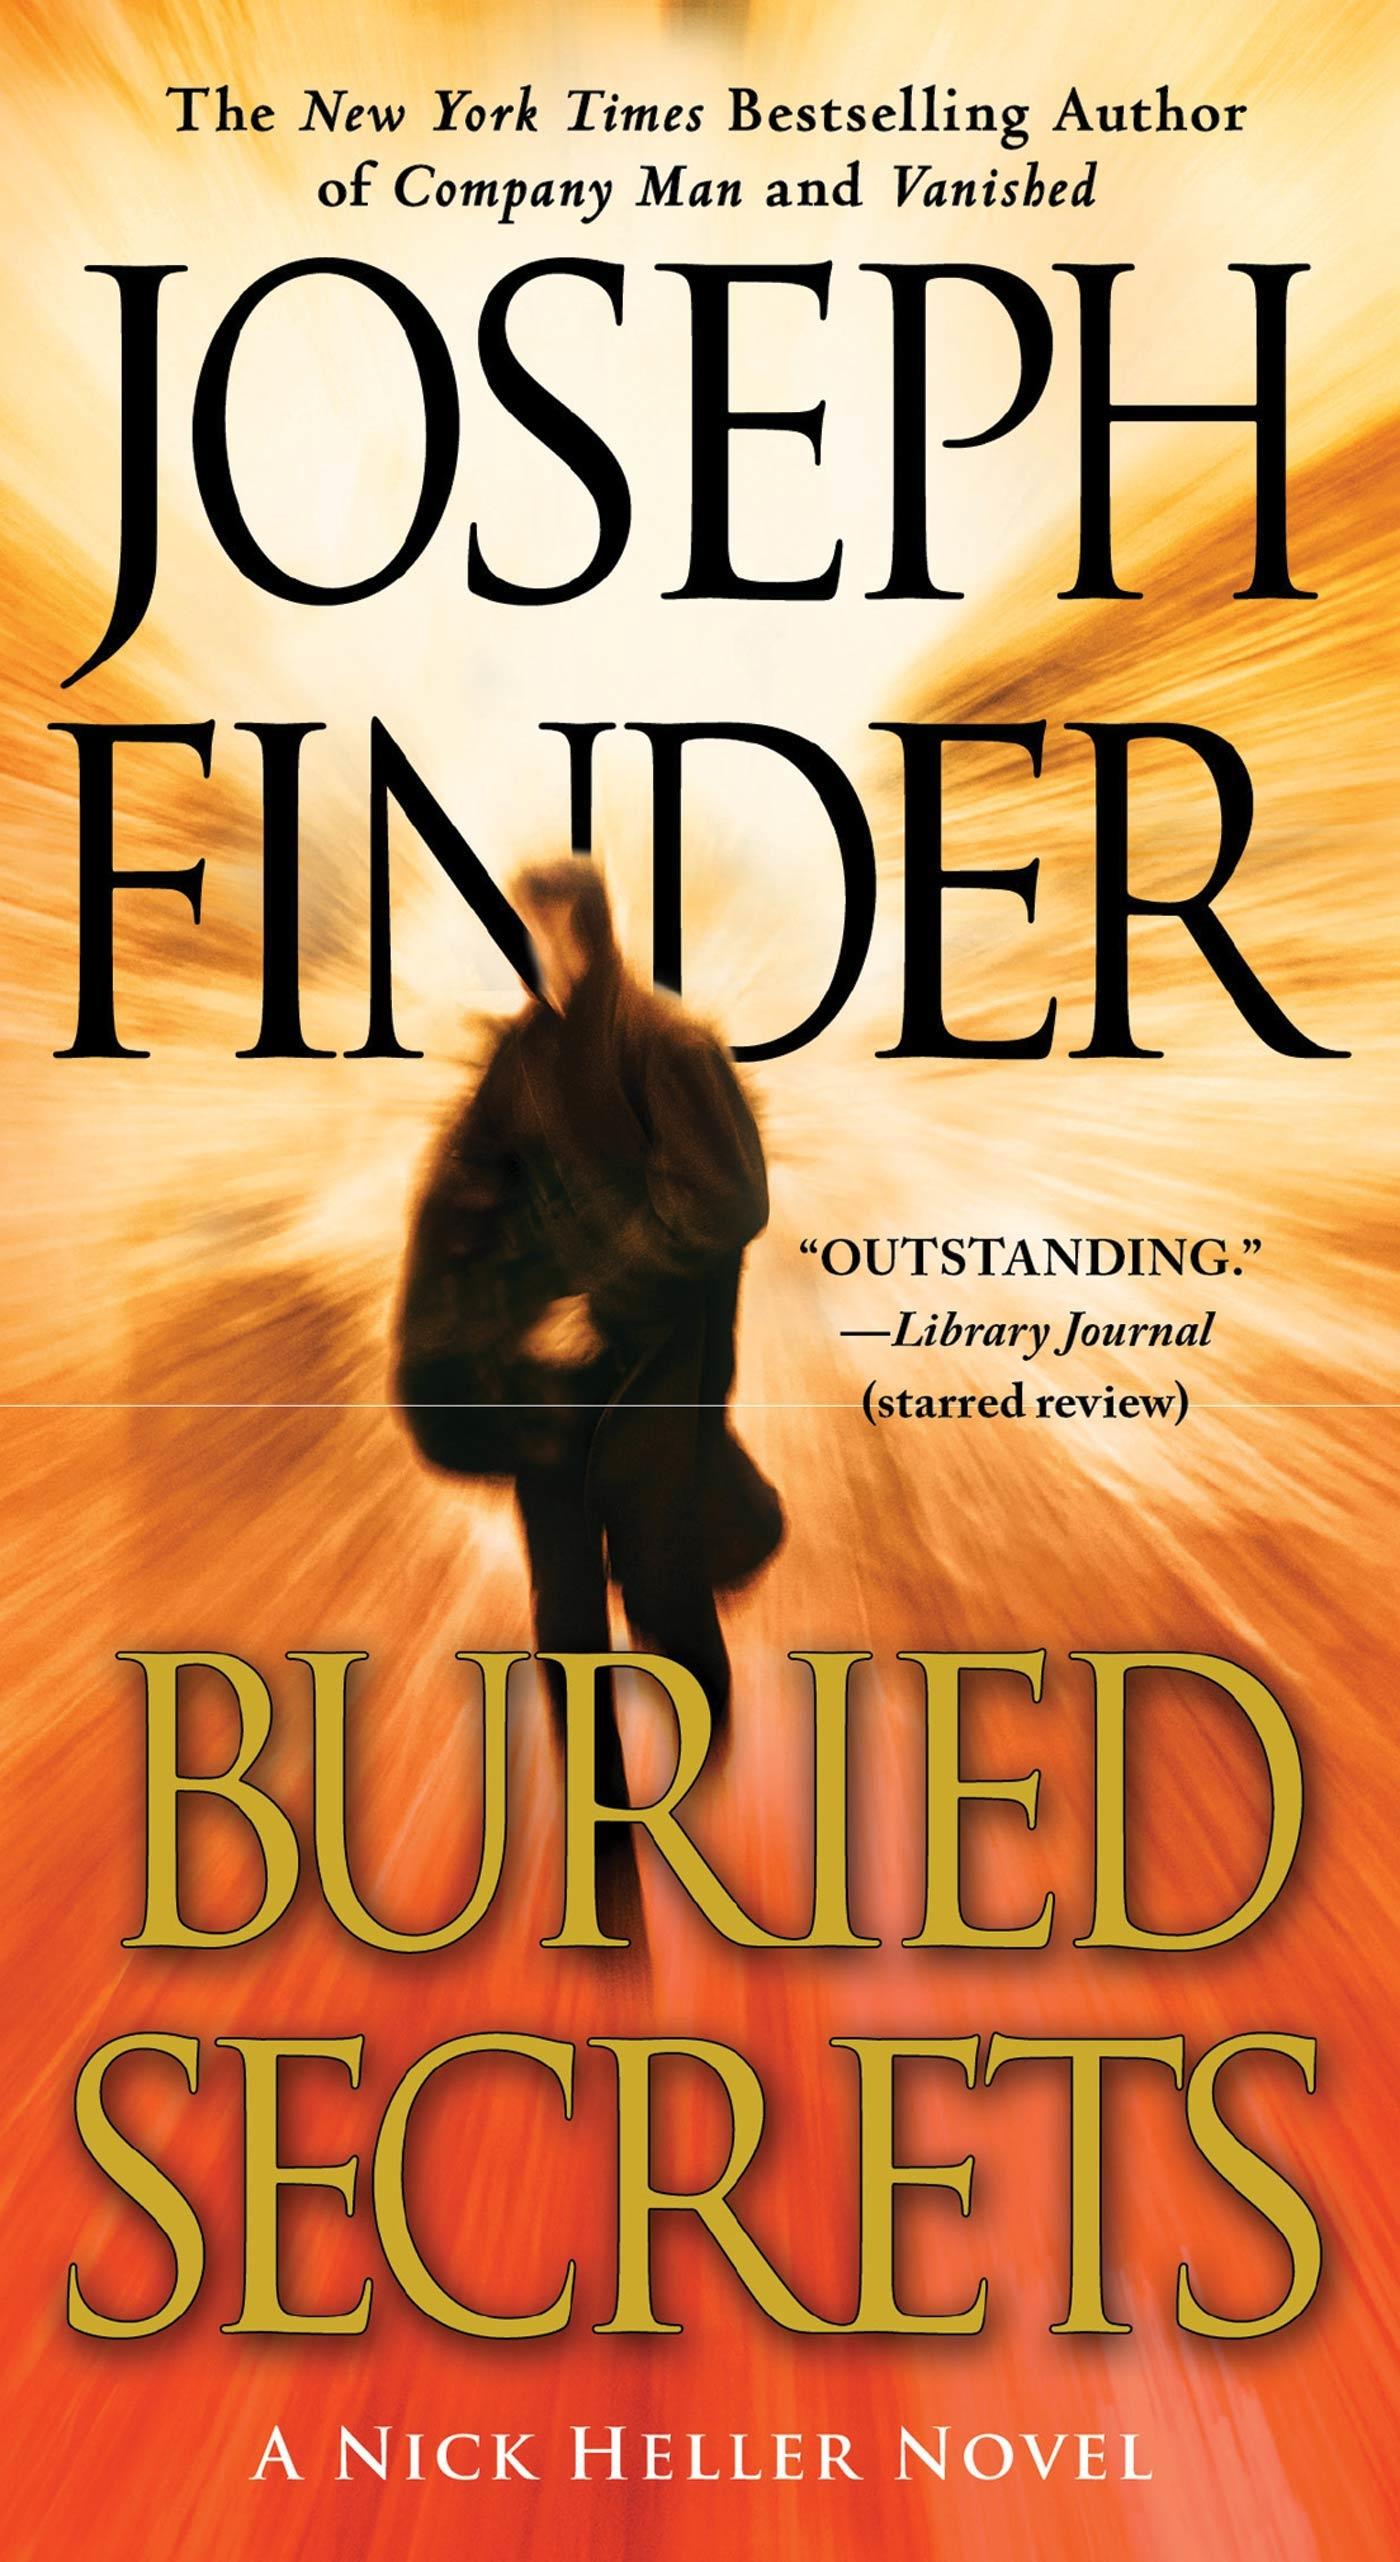 Buried Secrets A Nick Heller Novel